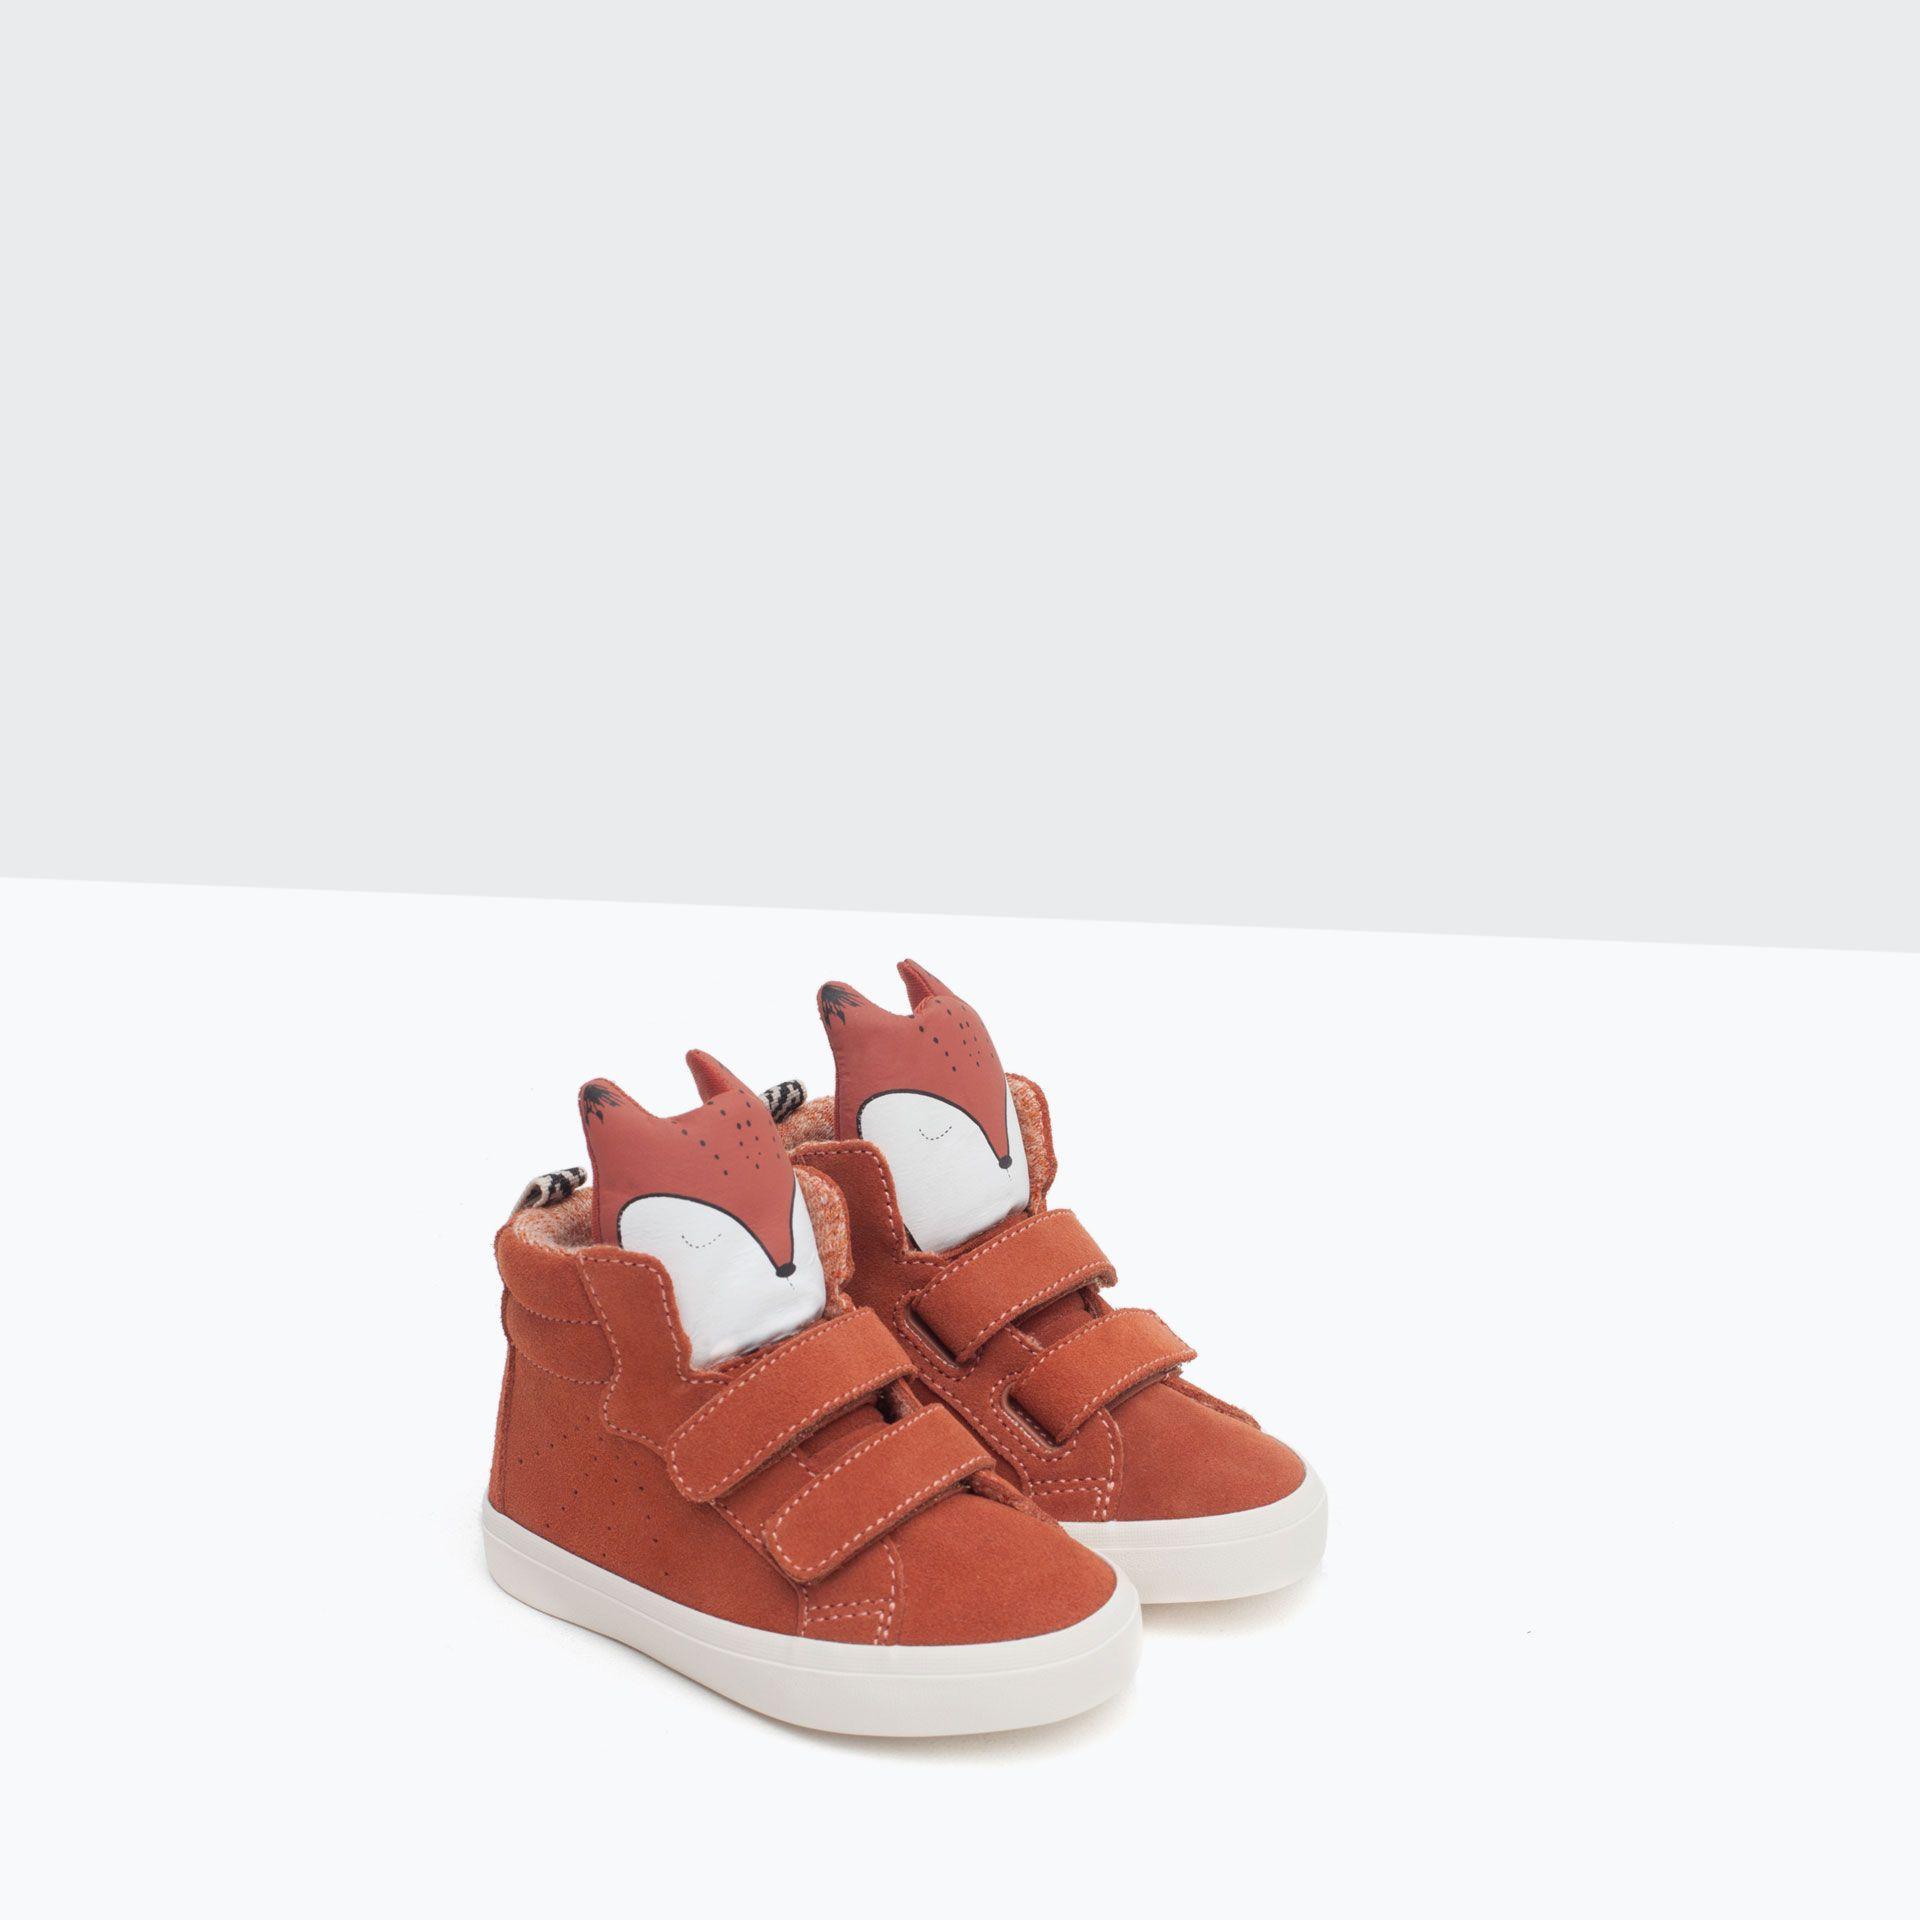 084a2e06eec BASKET PIEL DETALLE ZORRO - Zapatos - Bebé niño | 3 meses - 4 años - NIÑOS  | ZARA España